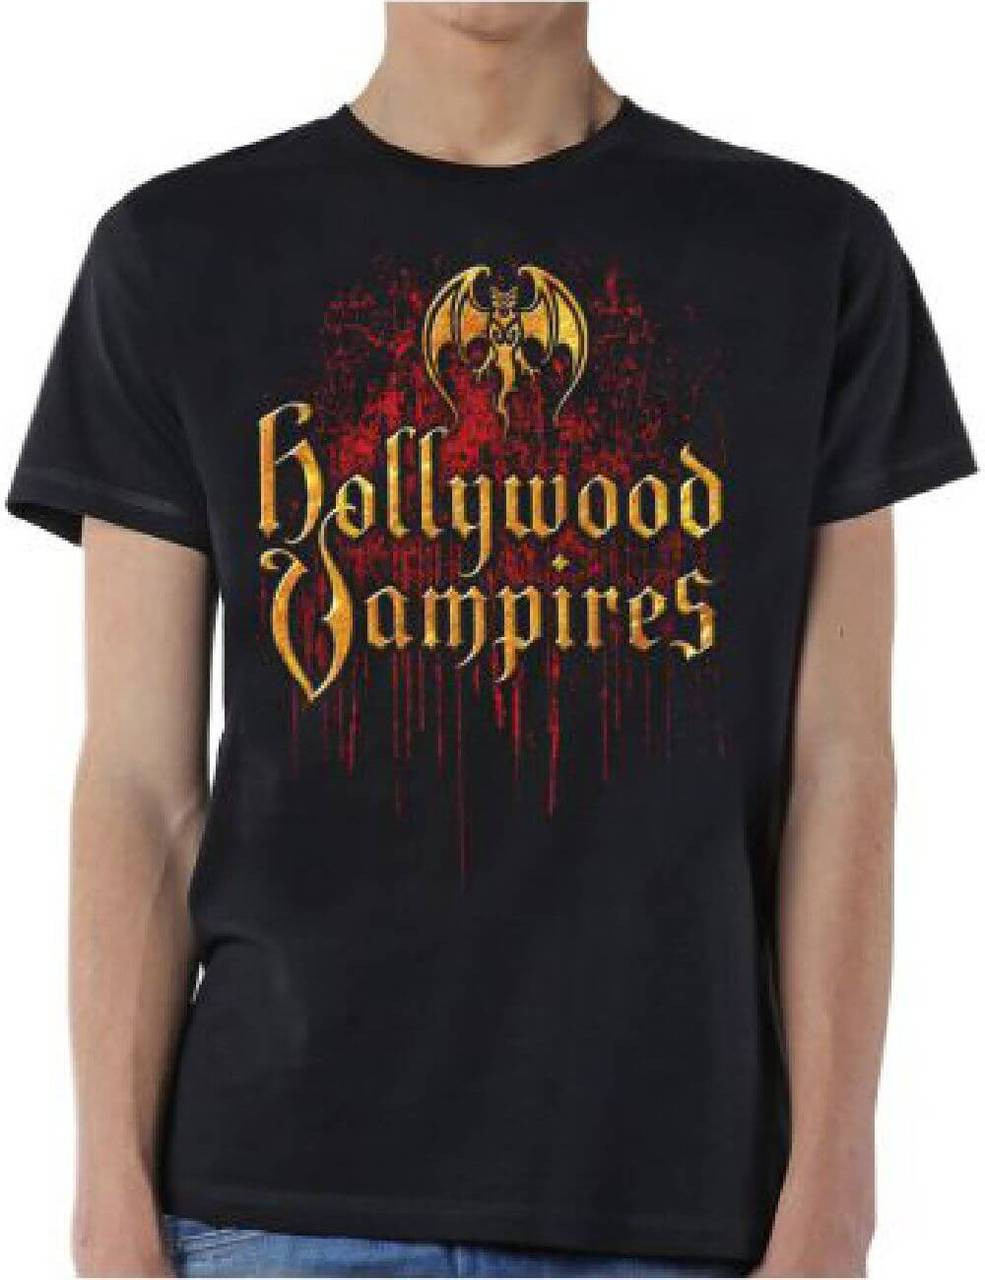 334b480cd2a524 Hollywood Vampires Supergroup Logo and Debut Album Cover Artwork Men's  Black T-shirt